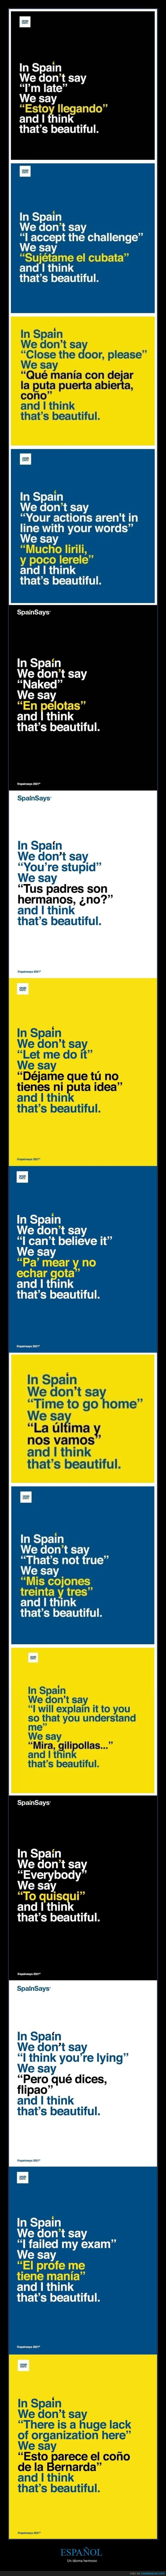 español,idioma,inglés